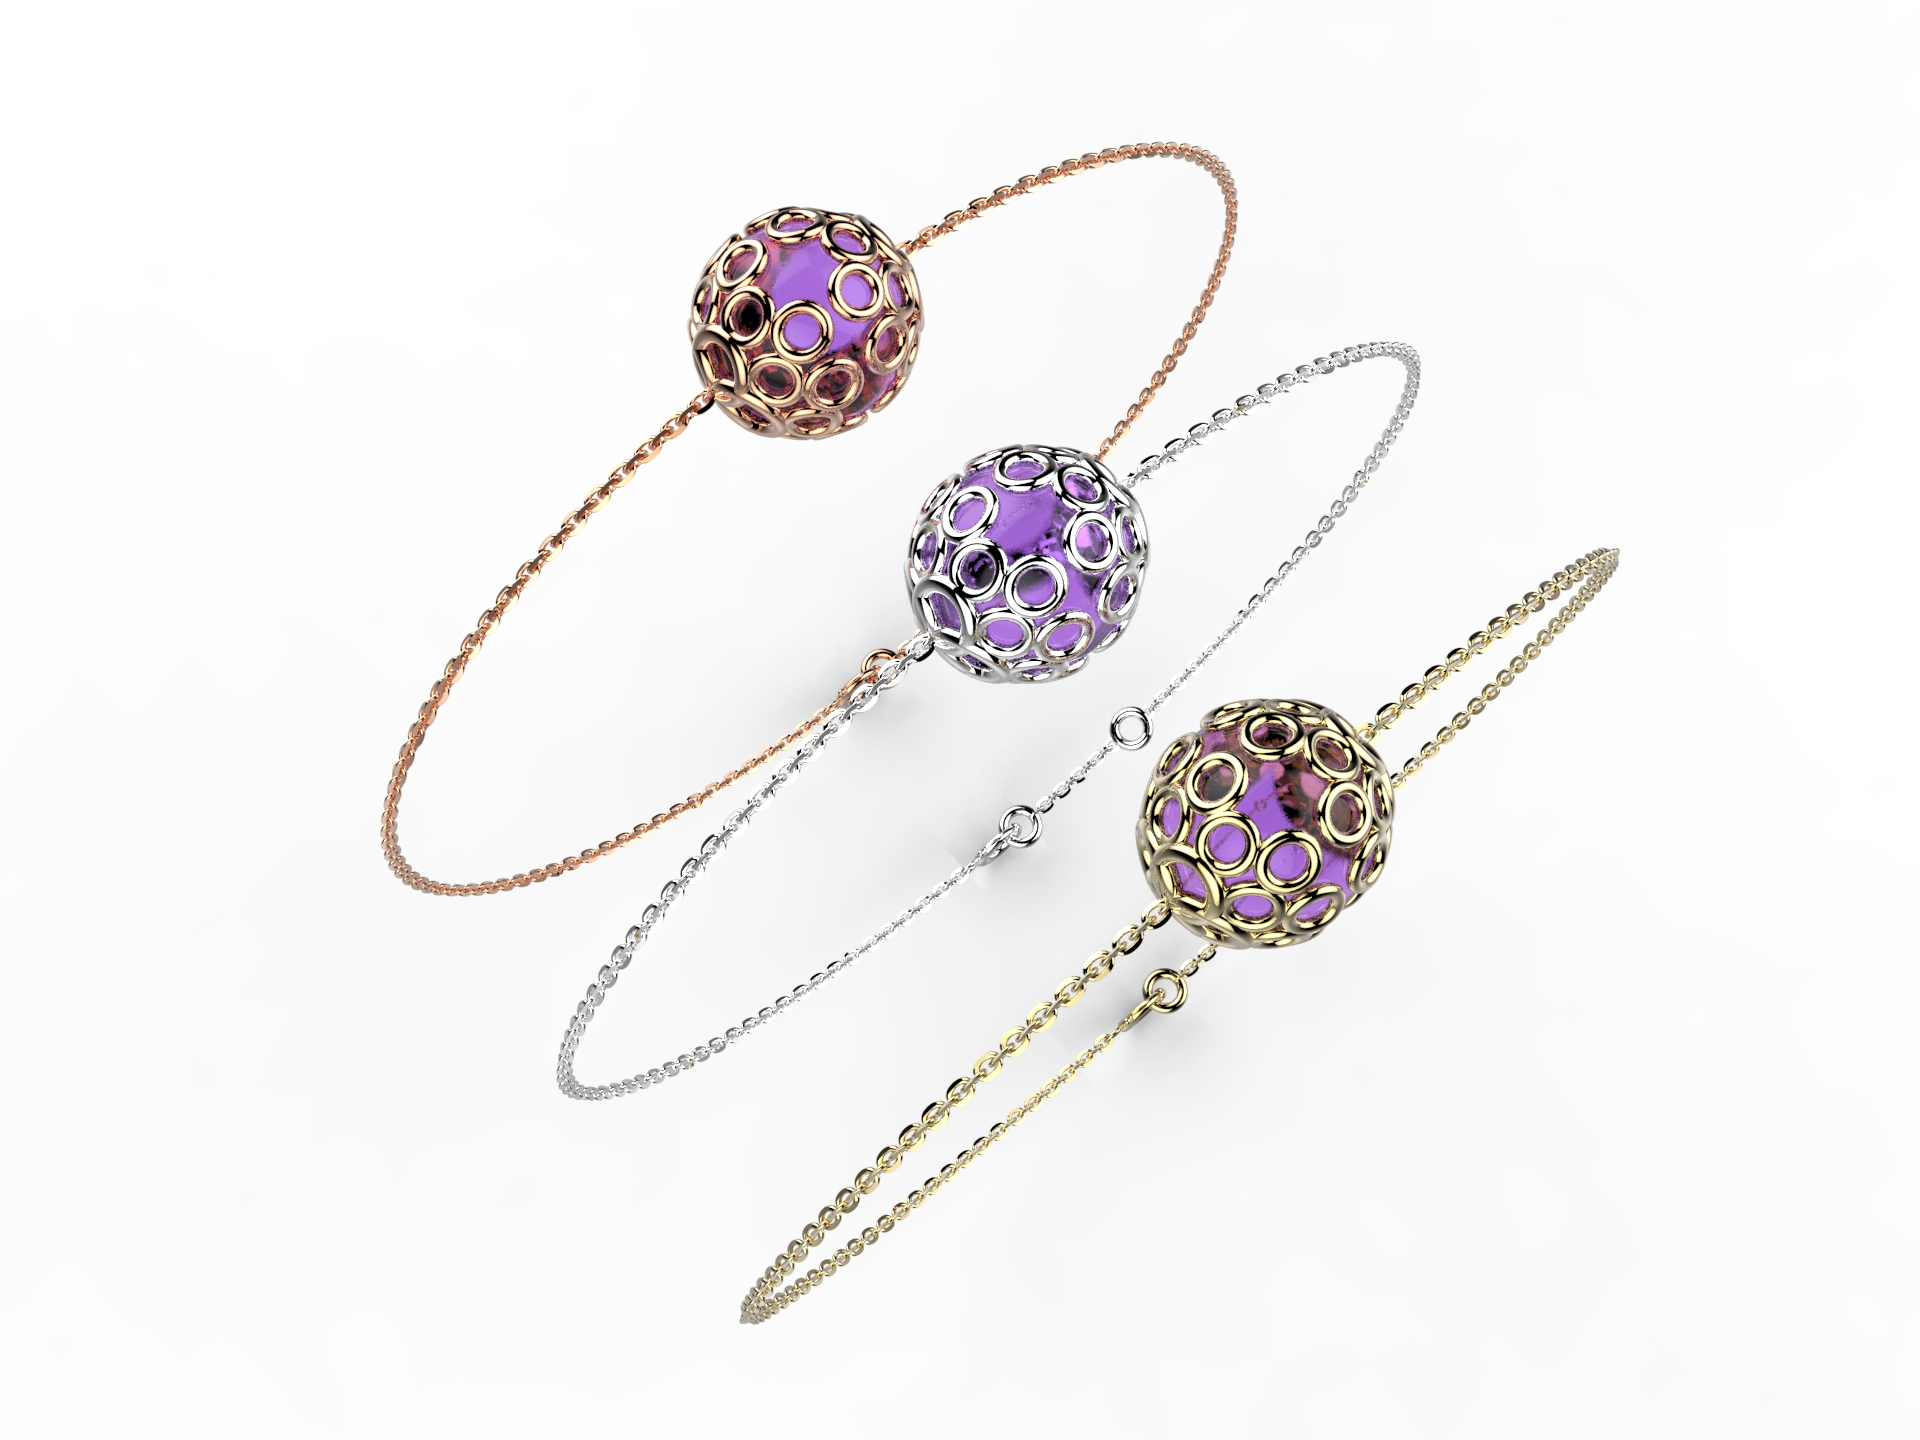 Bracelet or perle améthyste 350 €